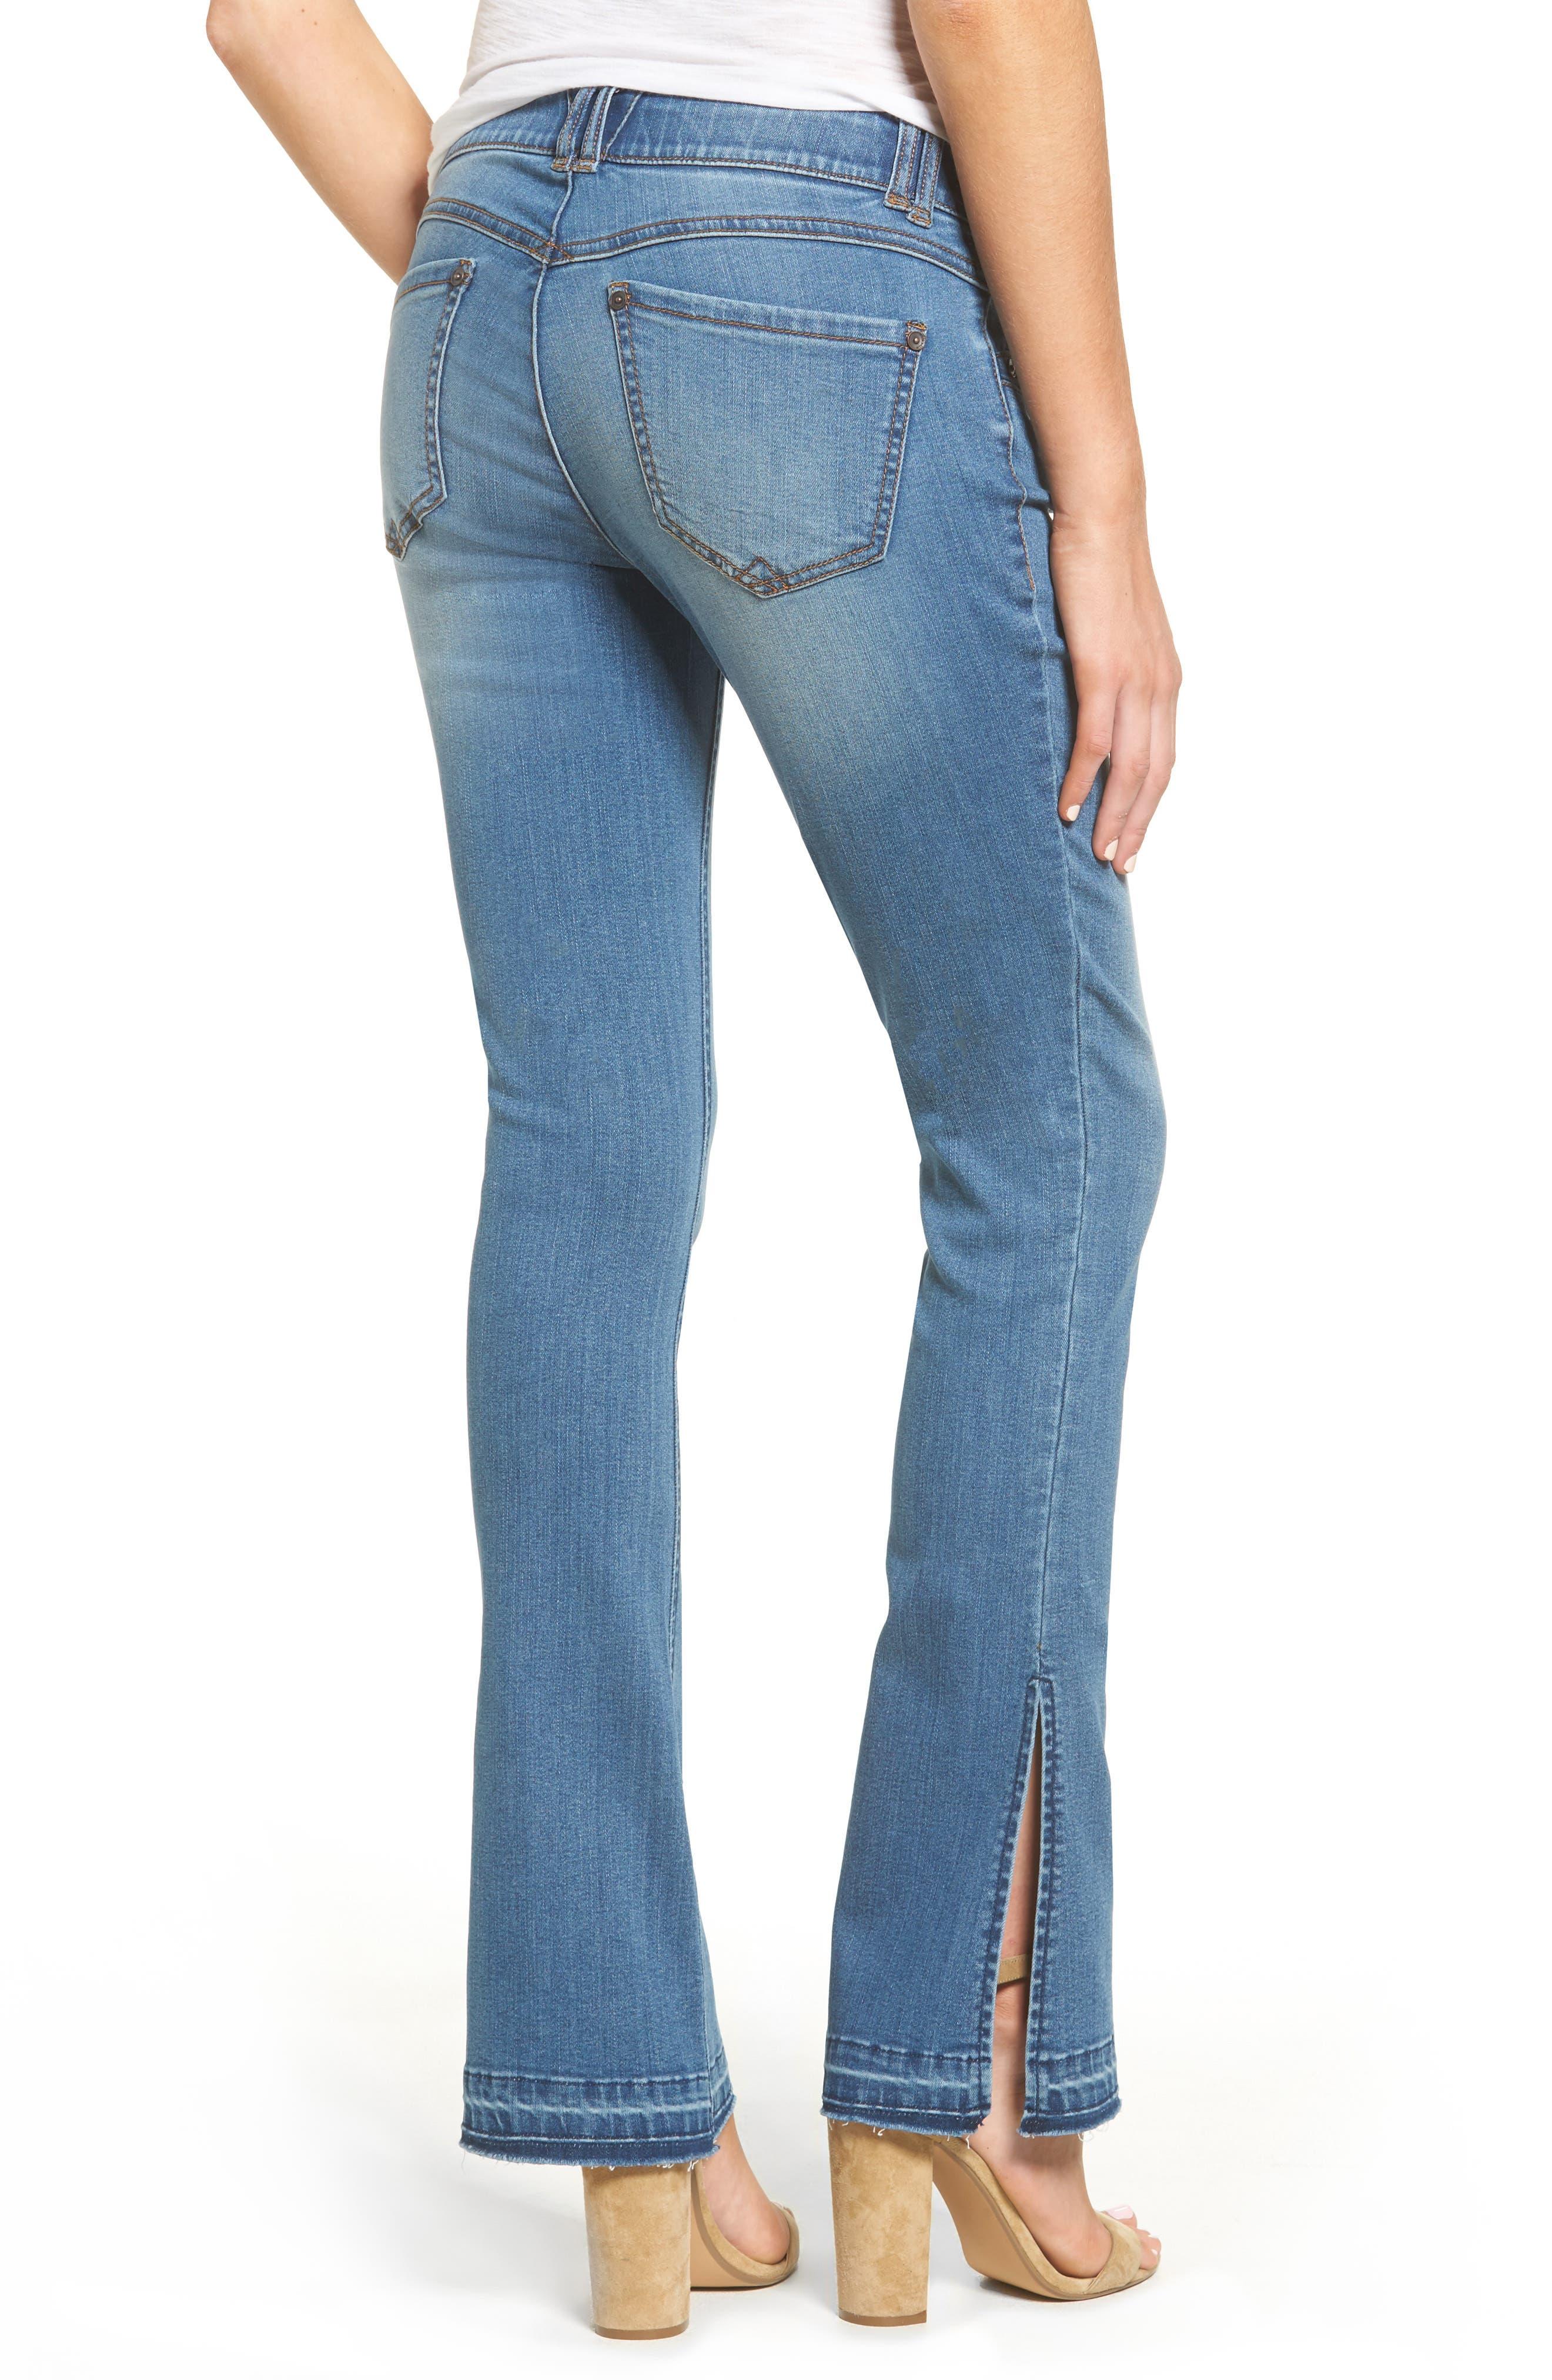 Alternate Image 2  - Wit & Wisdom Ab-solution Split Release Hem Jeans (Regular & Petite) (Nordstrom Exclusive)